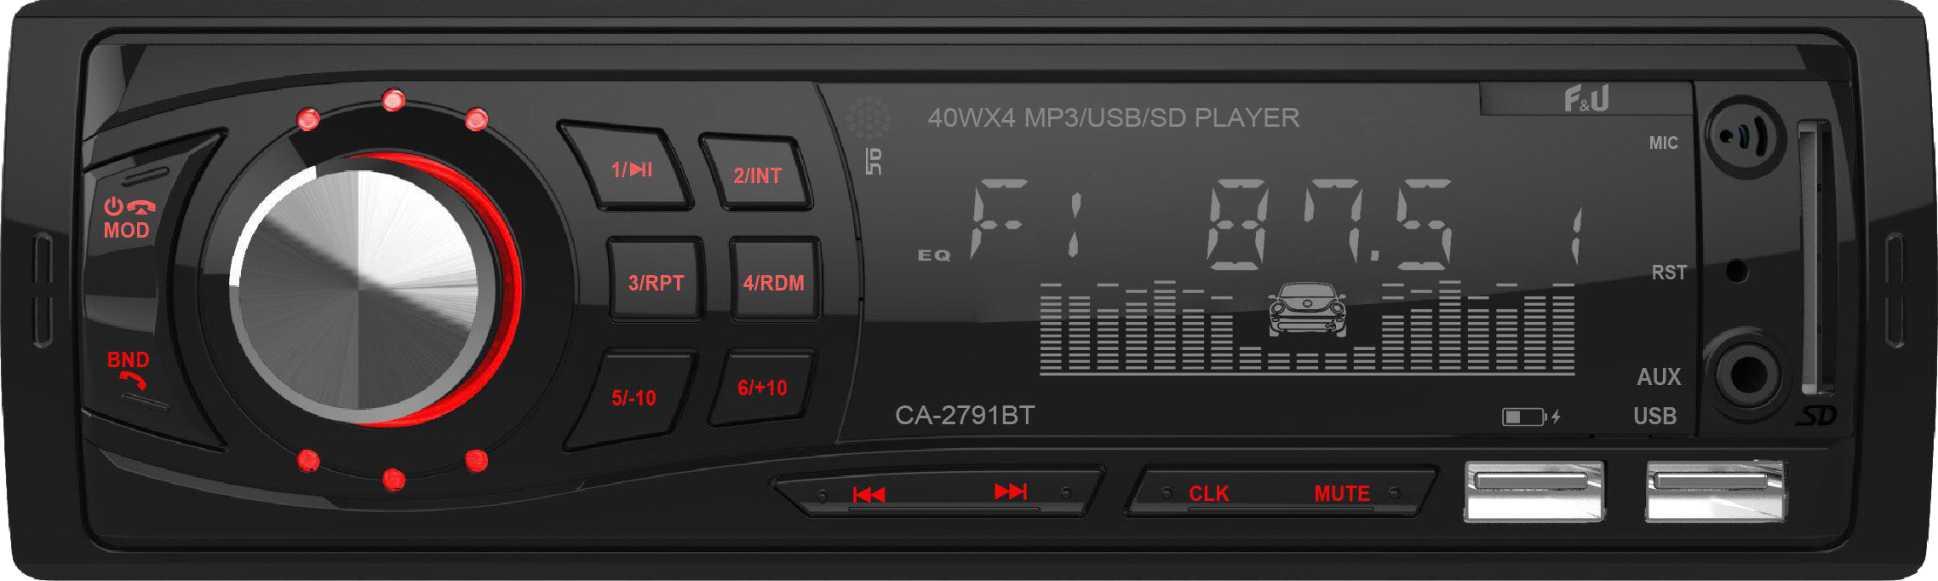 F&U CA-2791BT Ηχοσύστημα 1DIN με Bluetooth